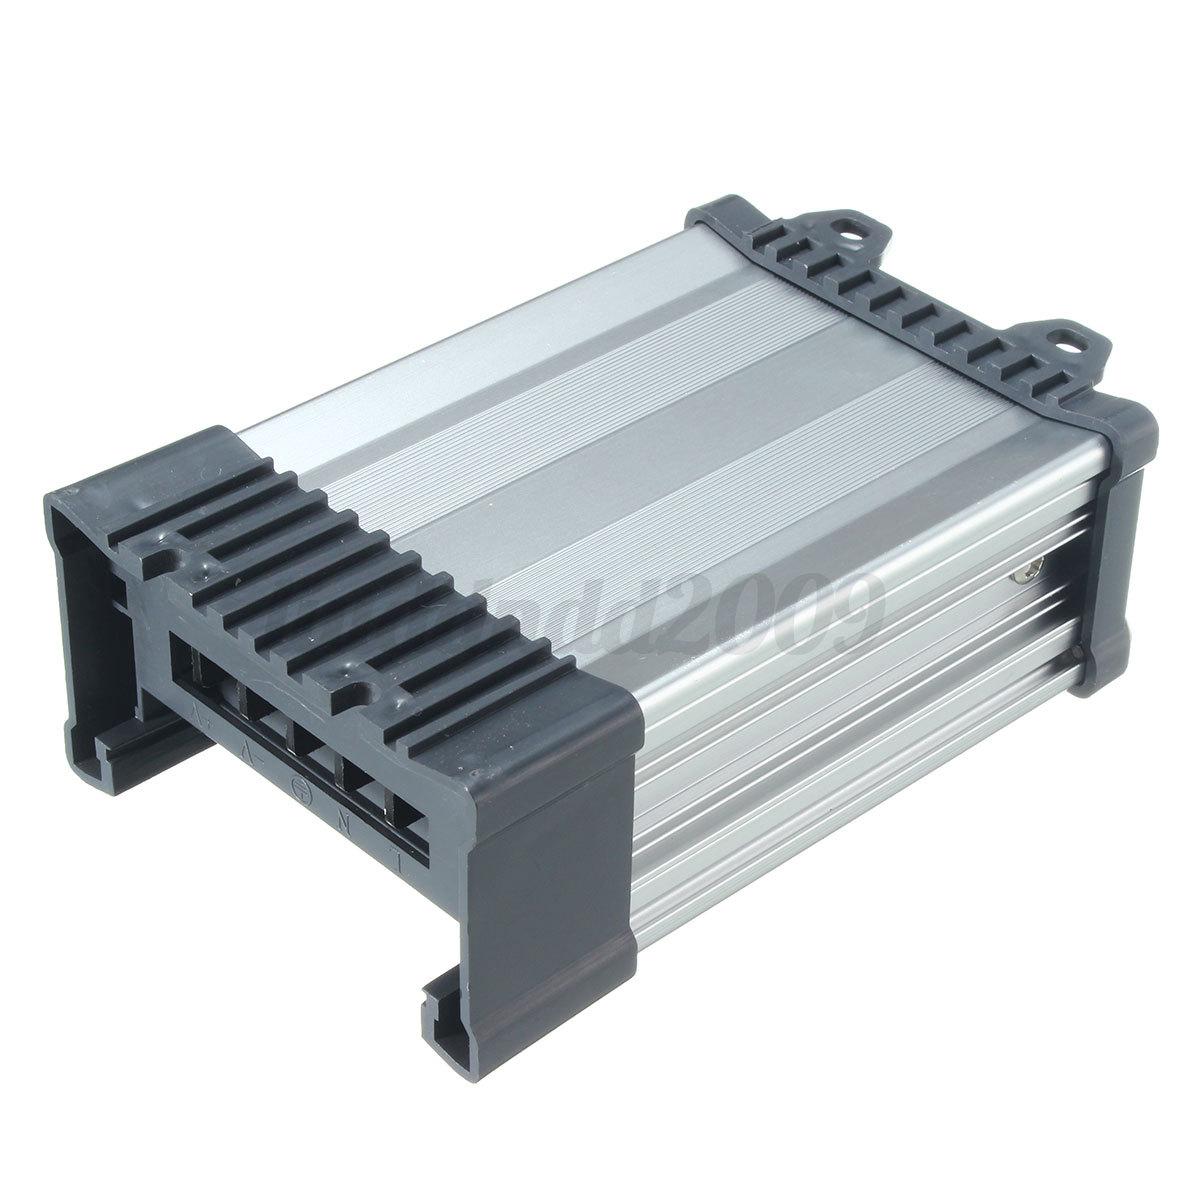 AC 110V TO DC 12V 10A 120W Transformer Switch Power Supply ...